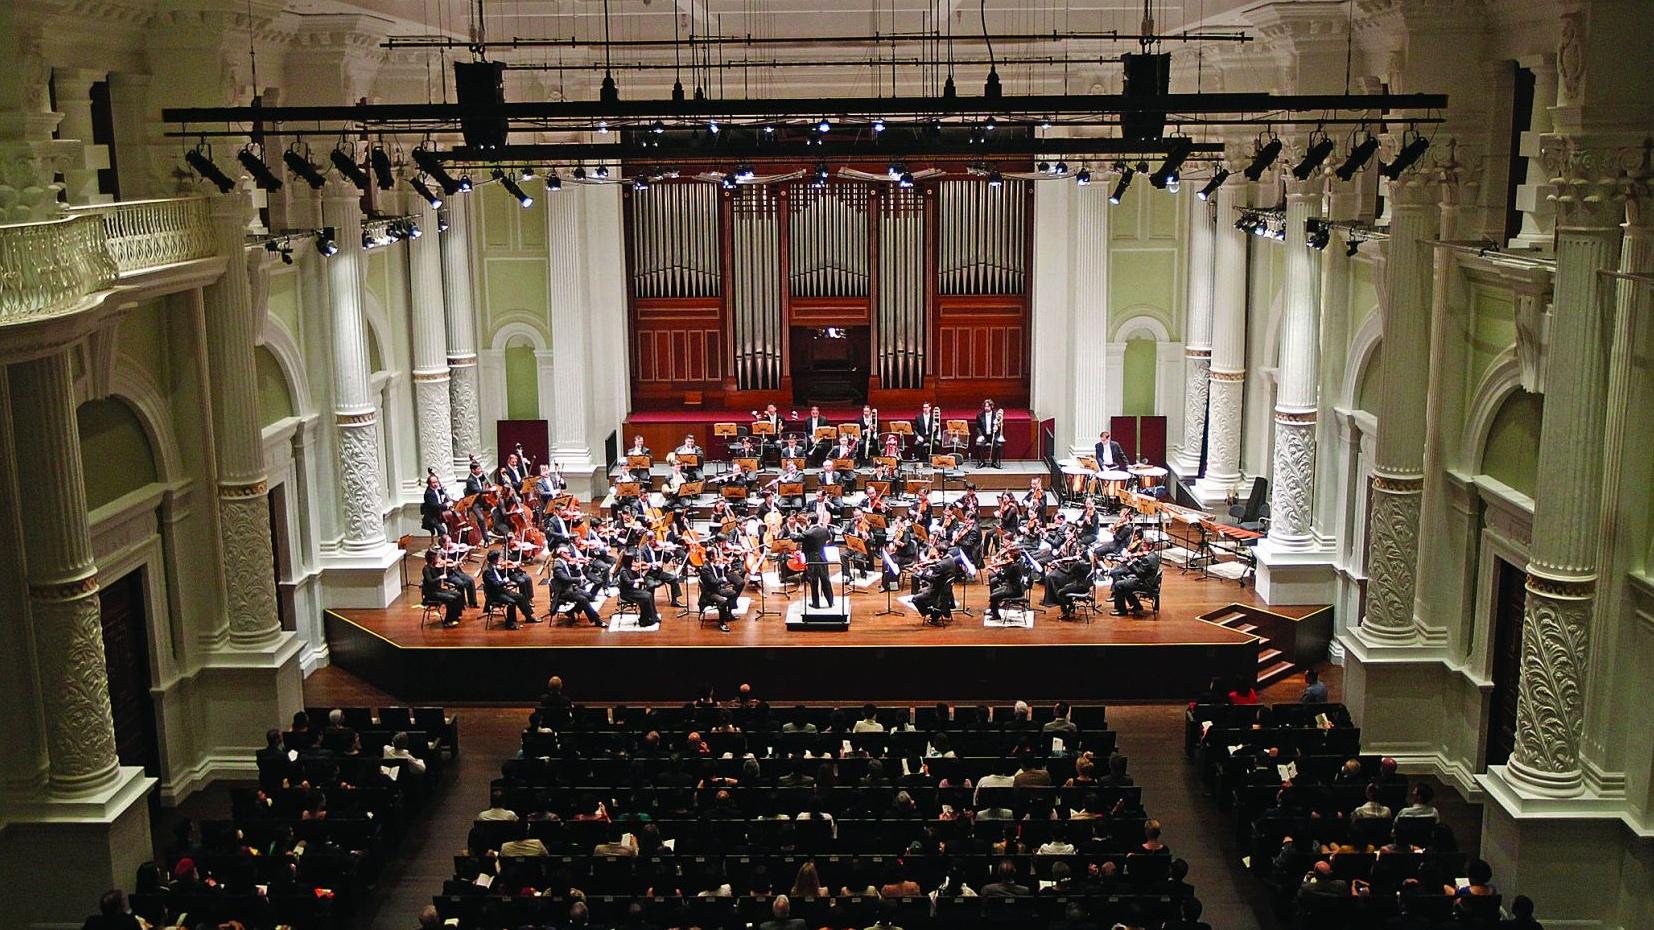 Victoria Concert Hall Klais Organ by Dr Margaret Chen